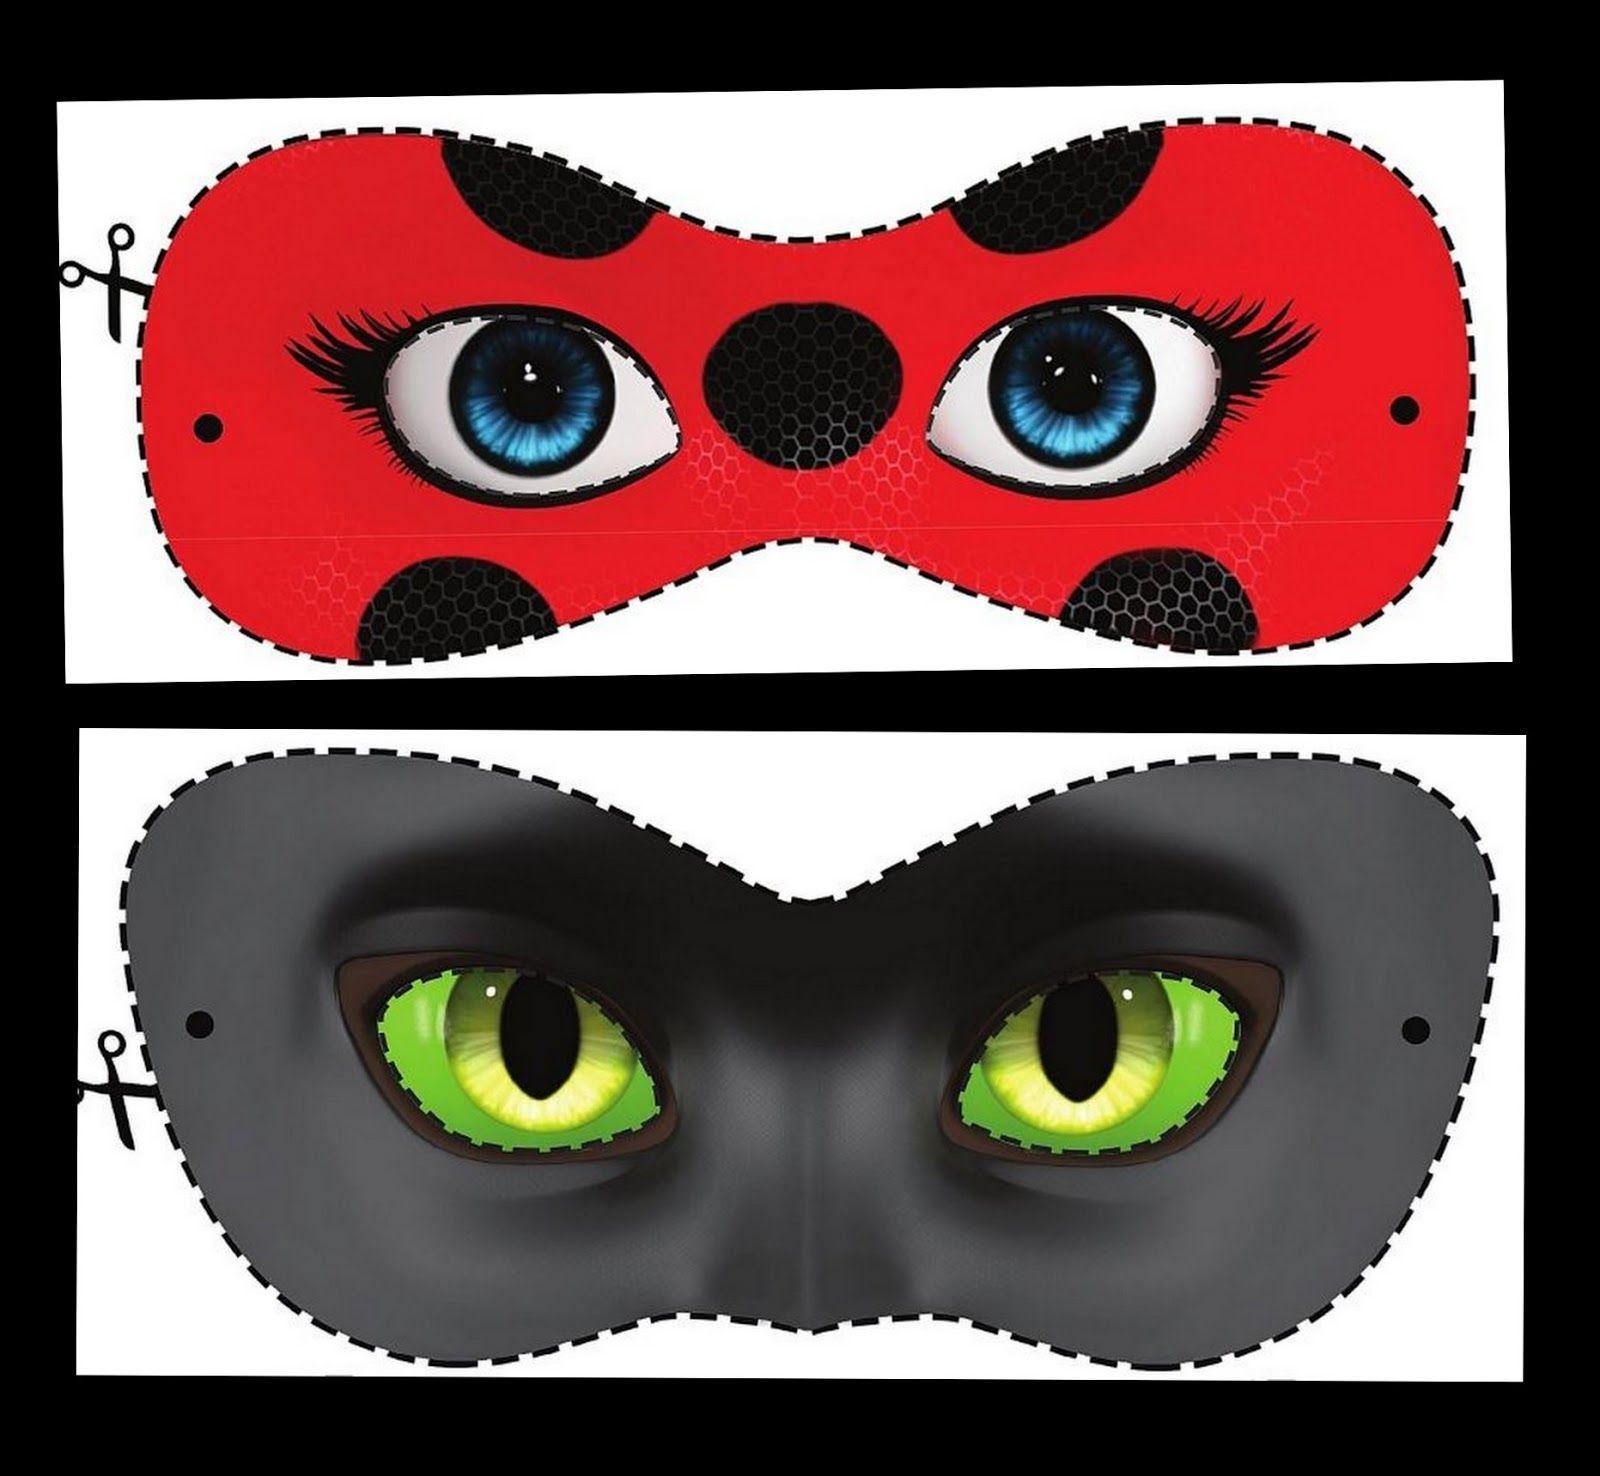 Free Printable Miraculous Ladybug And Cat Noir Masks Oh My Fiesta In English Ladybug Birthday Party Ladybug Party Ladybug Birthday